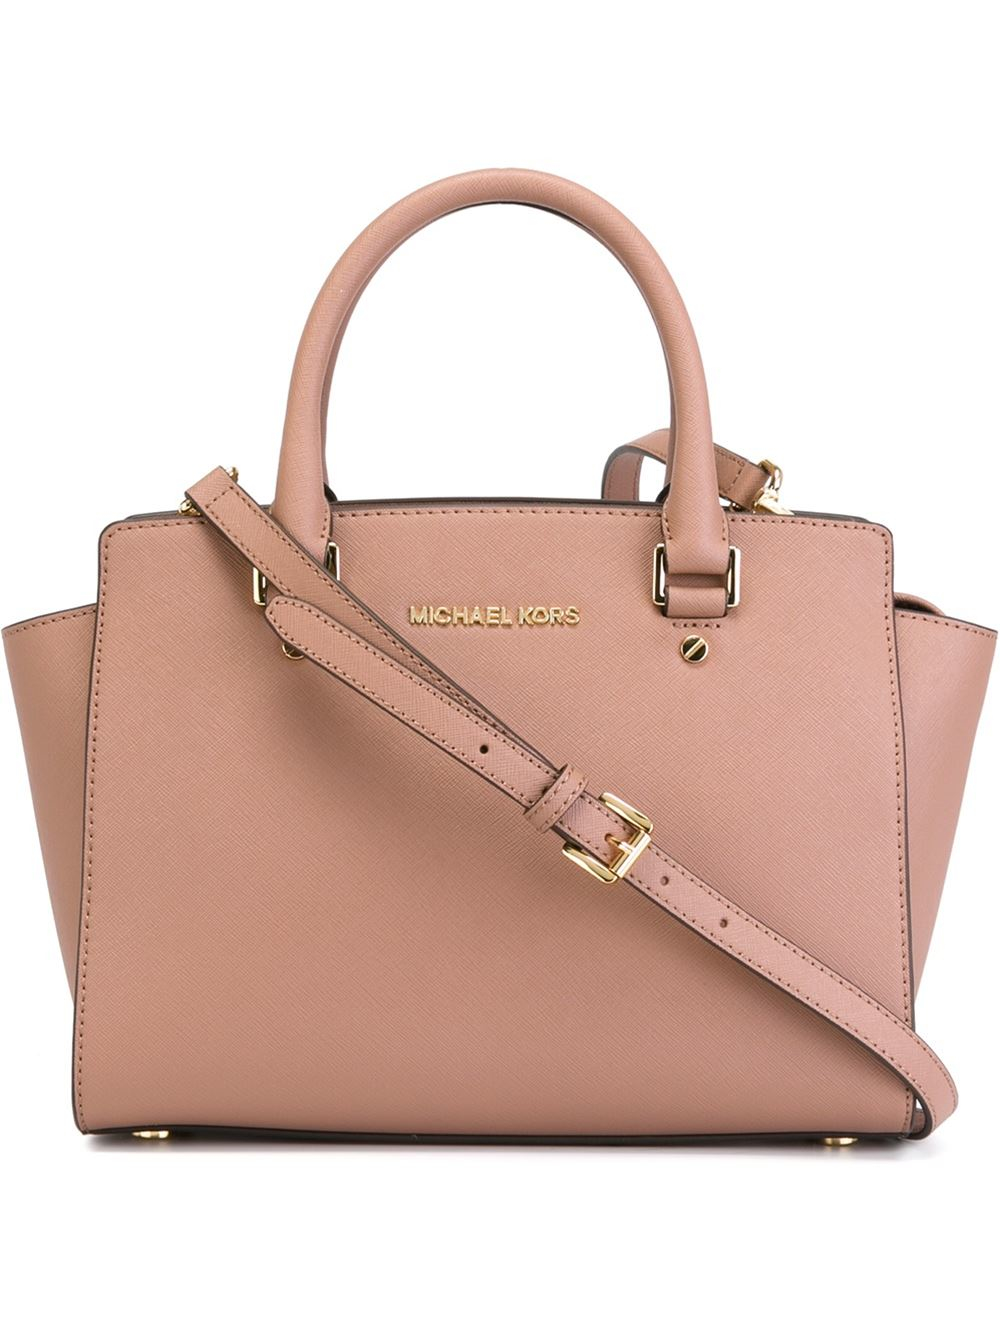 dd8e569539c9 Selma Handbag Michael Kors - Foto Handbag All Collections ...